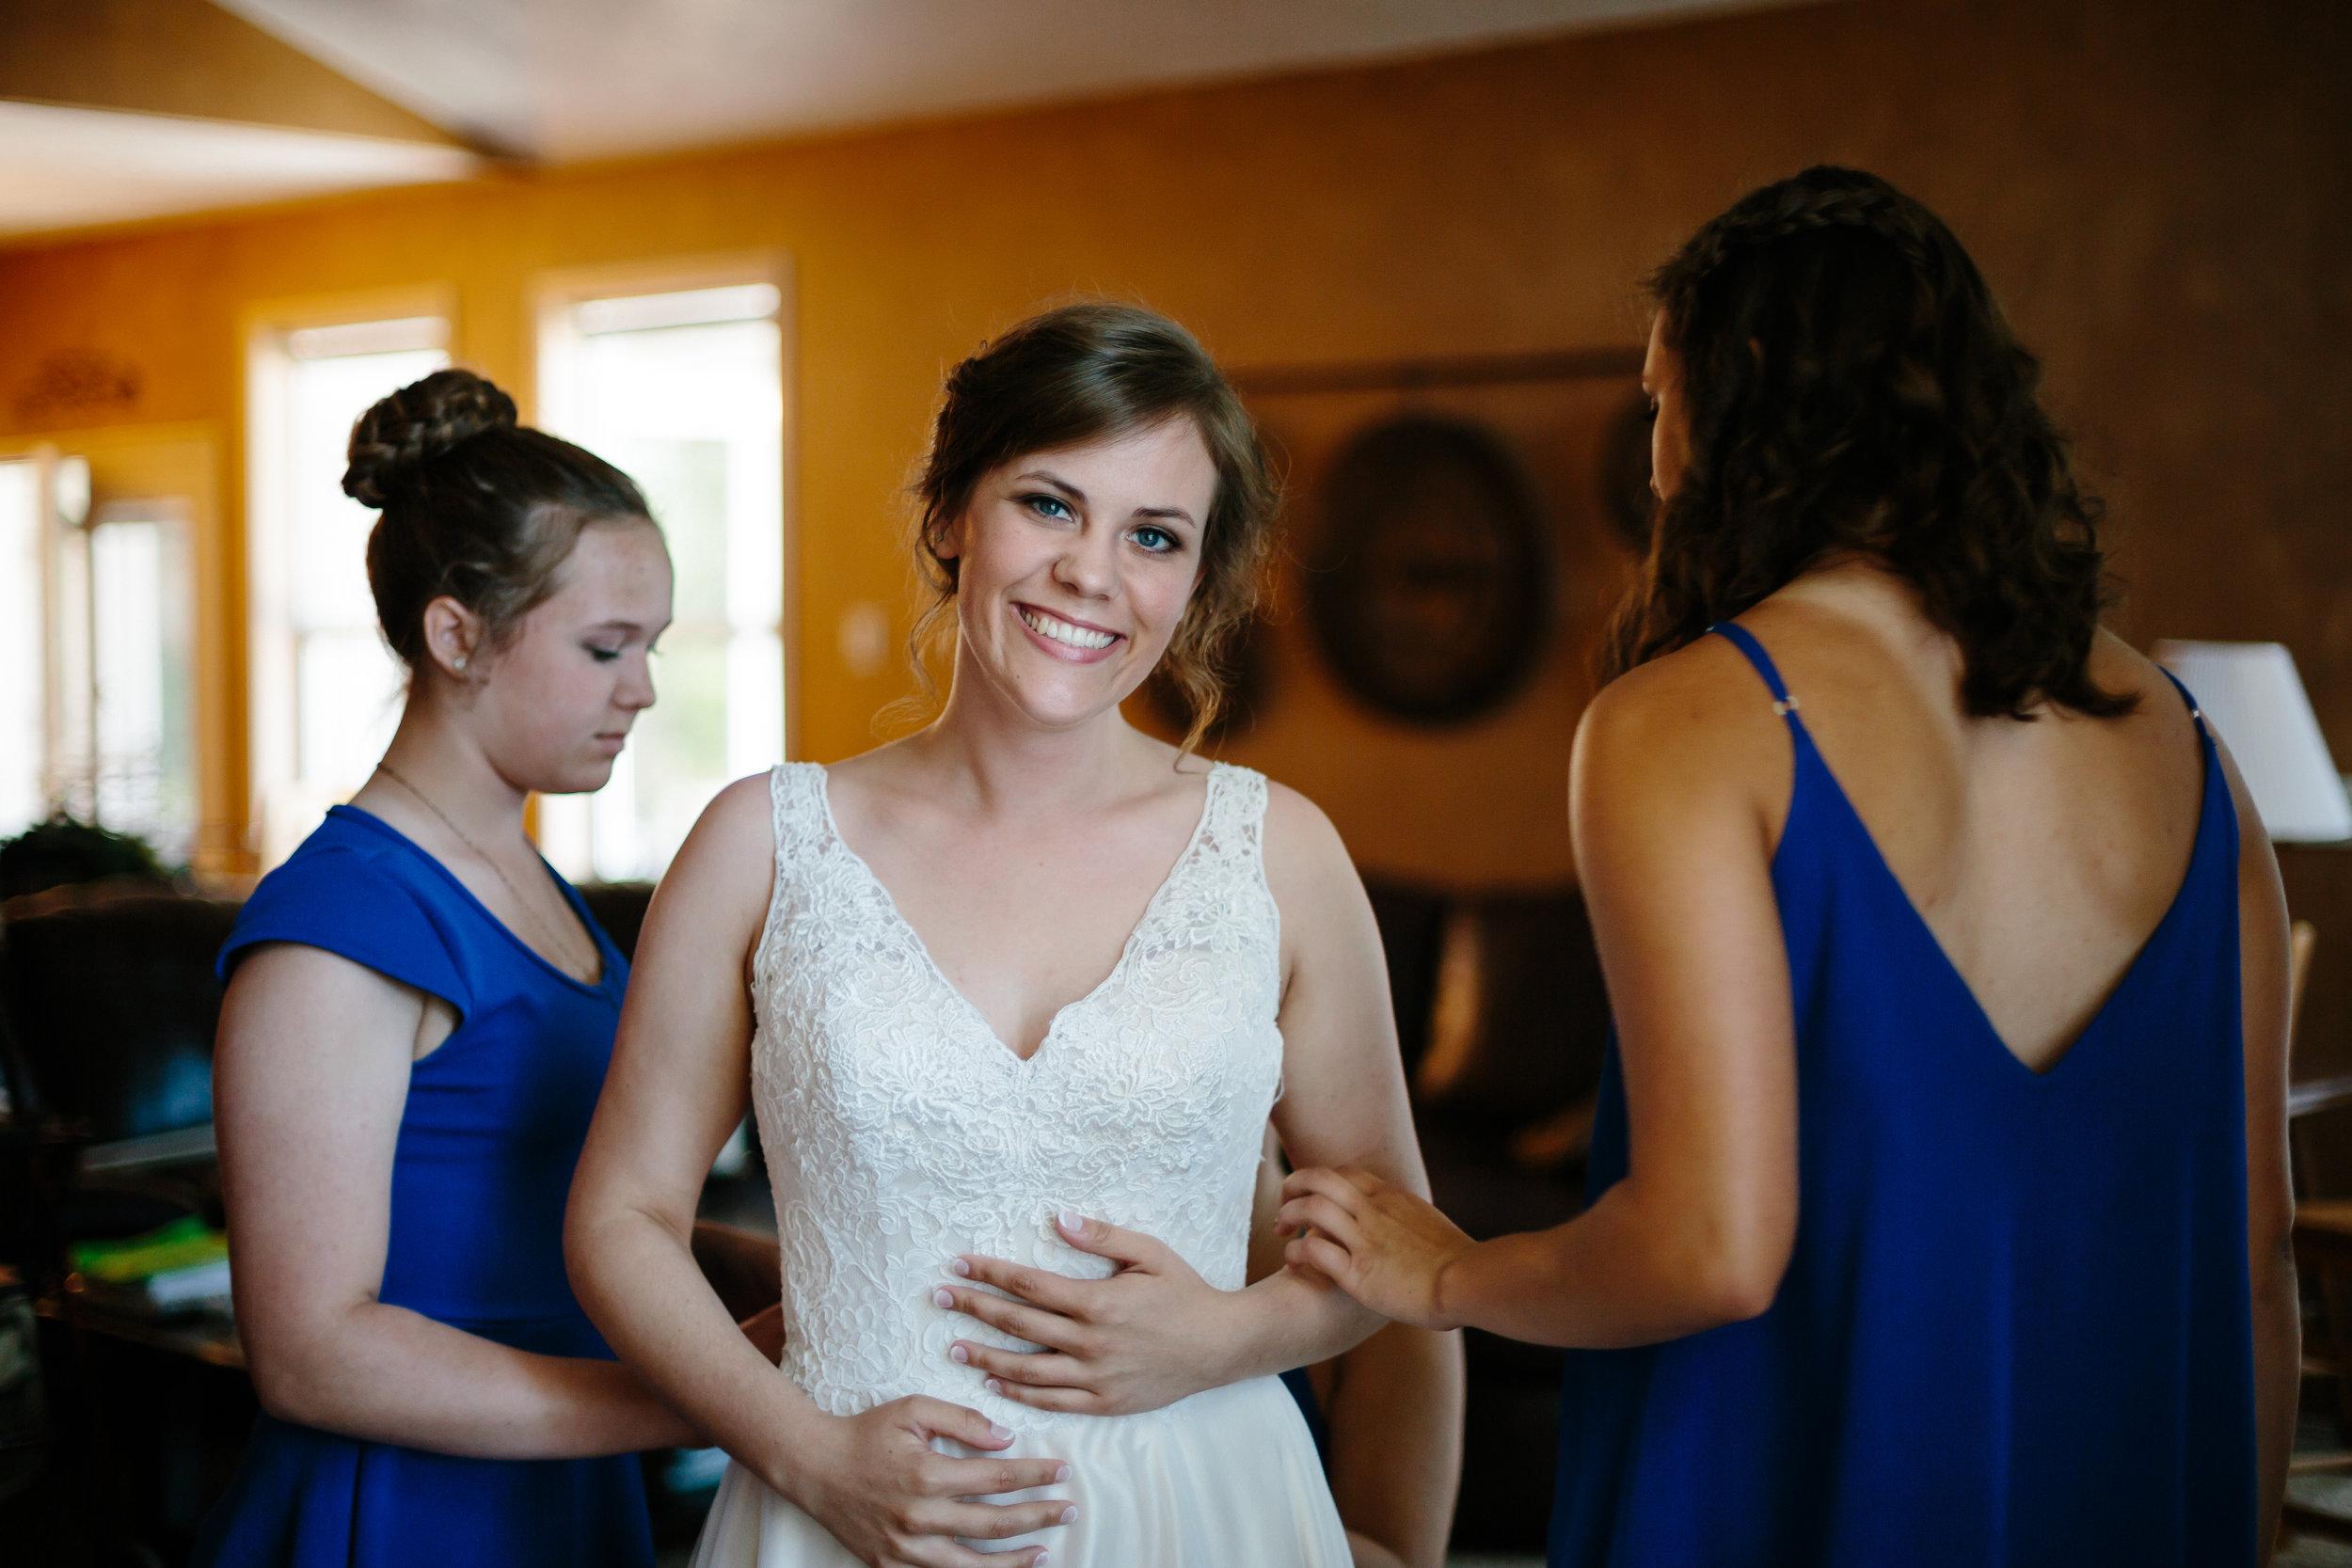 Jordan & Shantel Married - Idaho - Corrie Mick Photography-36.jpg